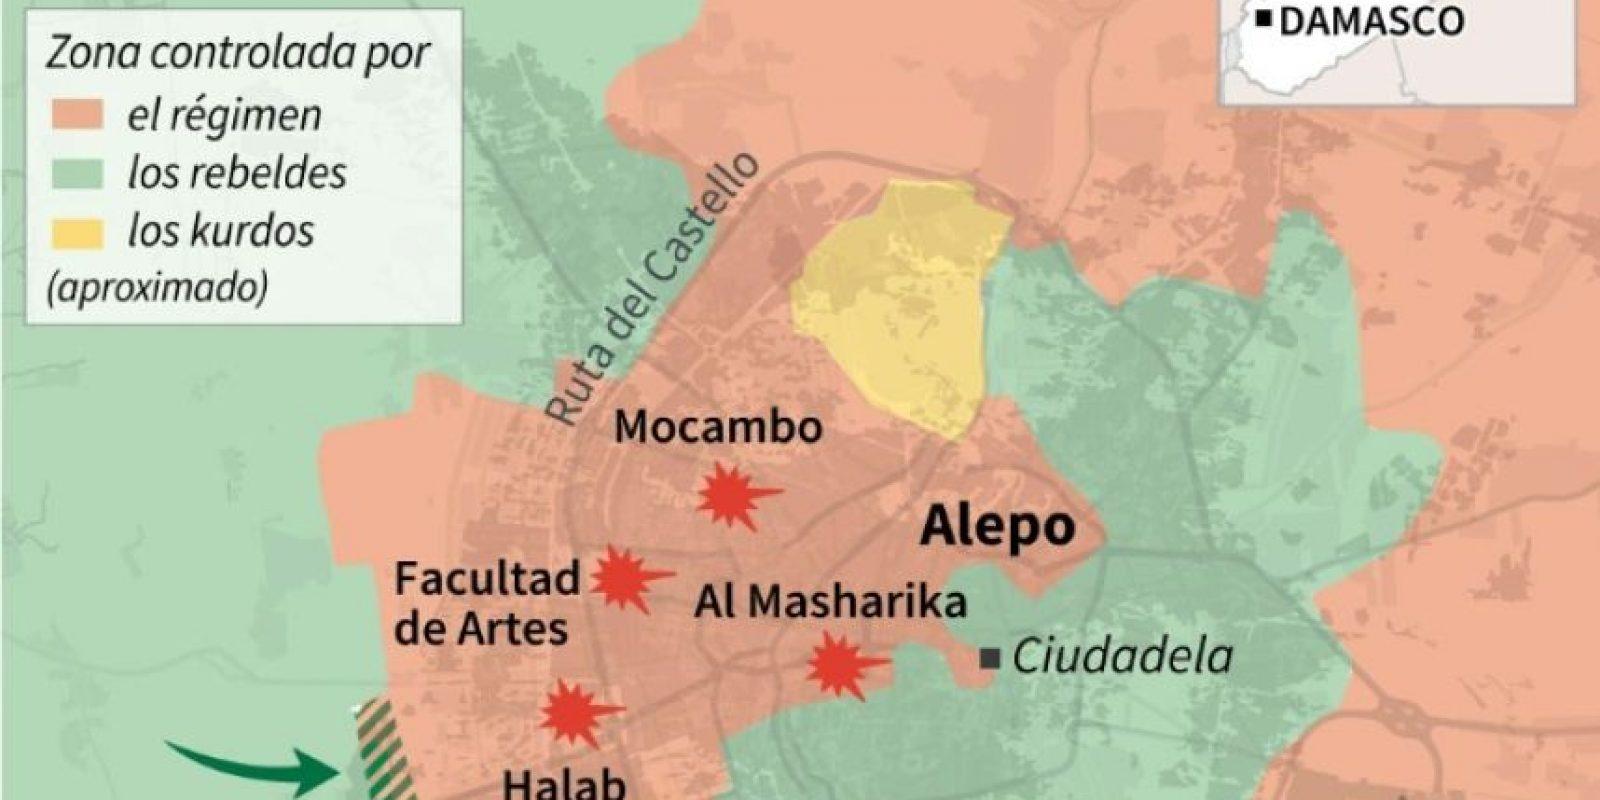 La batalla de Alepo Foto:Sabrina BLANCHARD, Omar KAMAL/afp.com